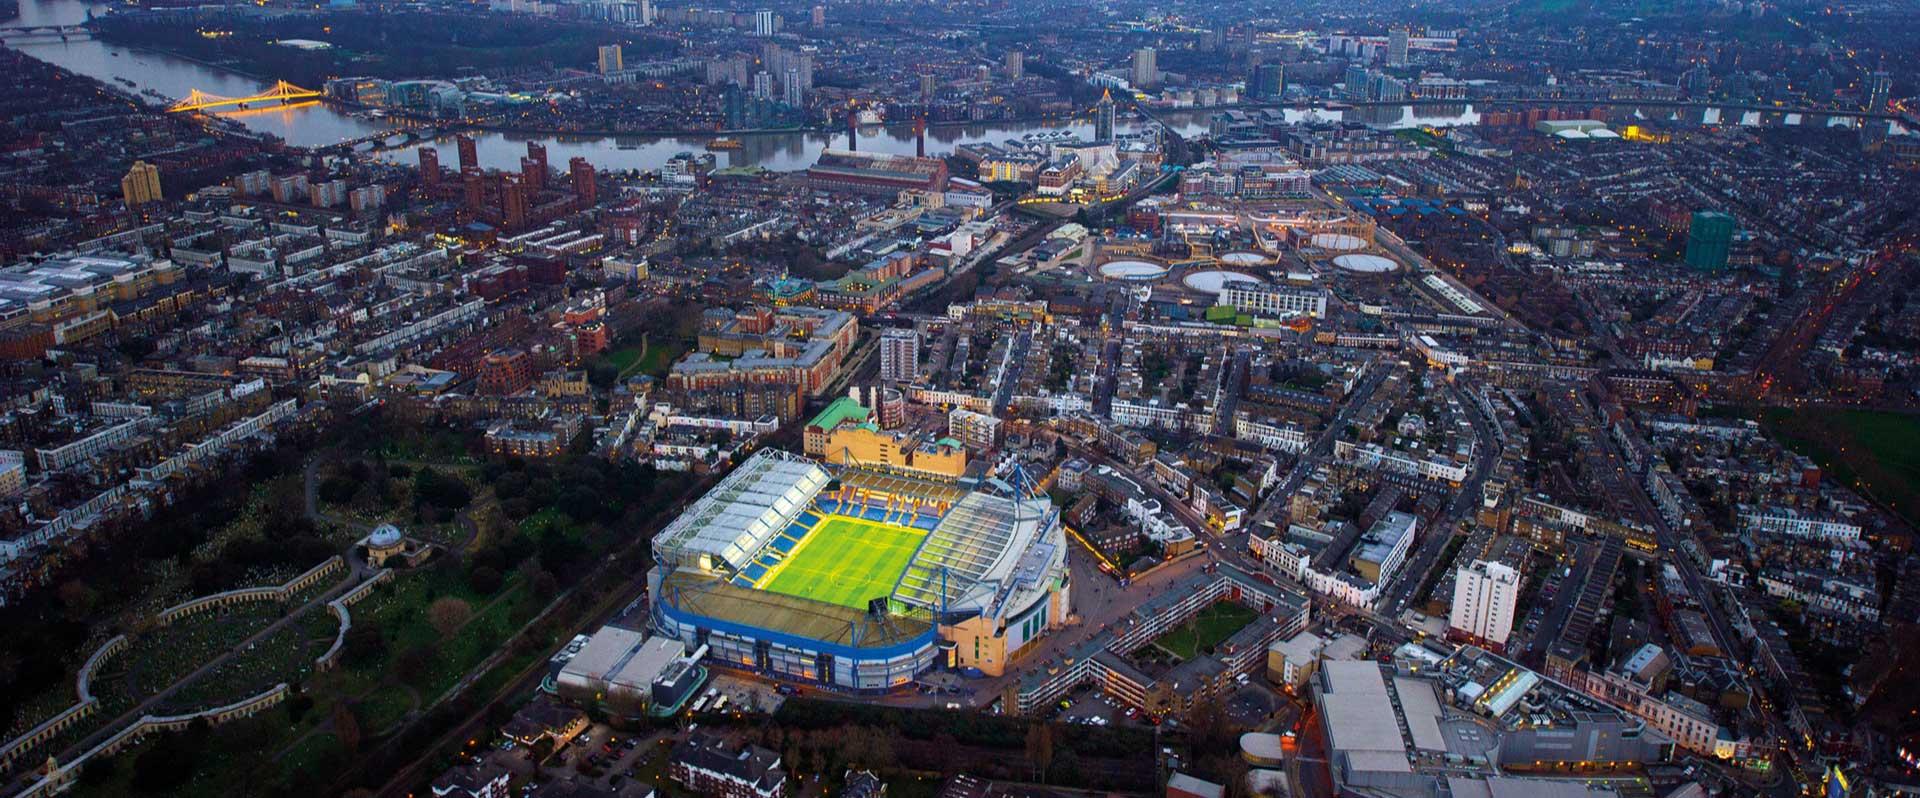 Chelsea stadium - London